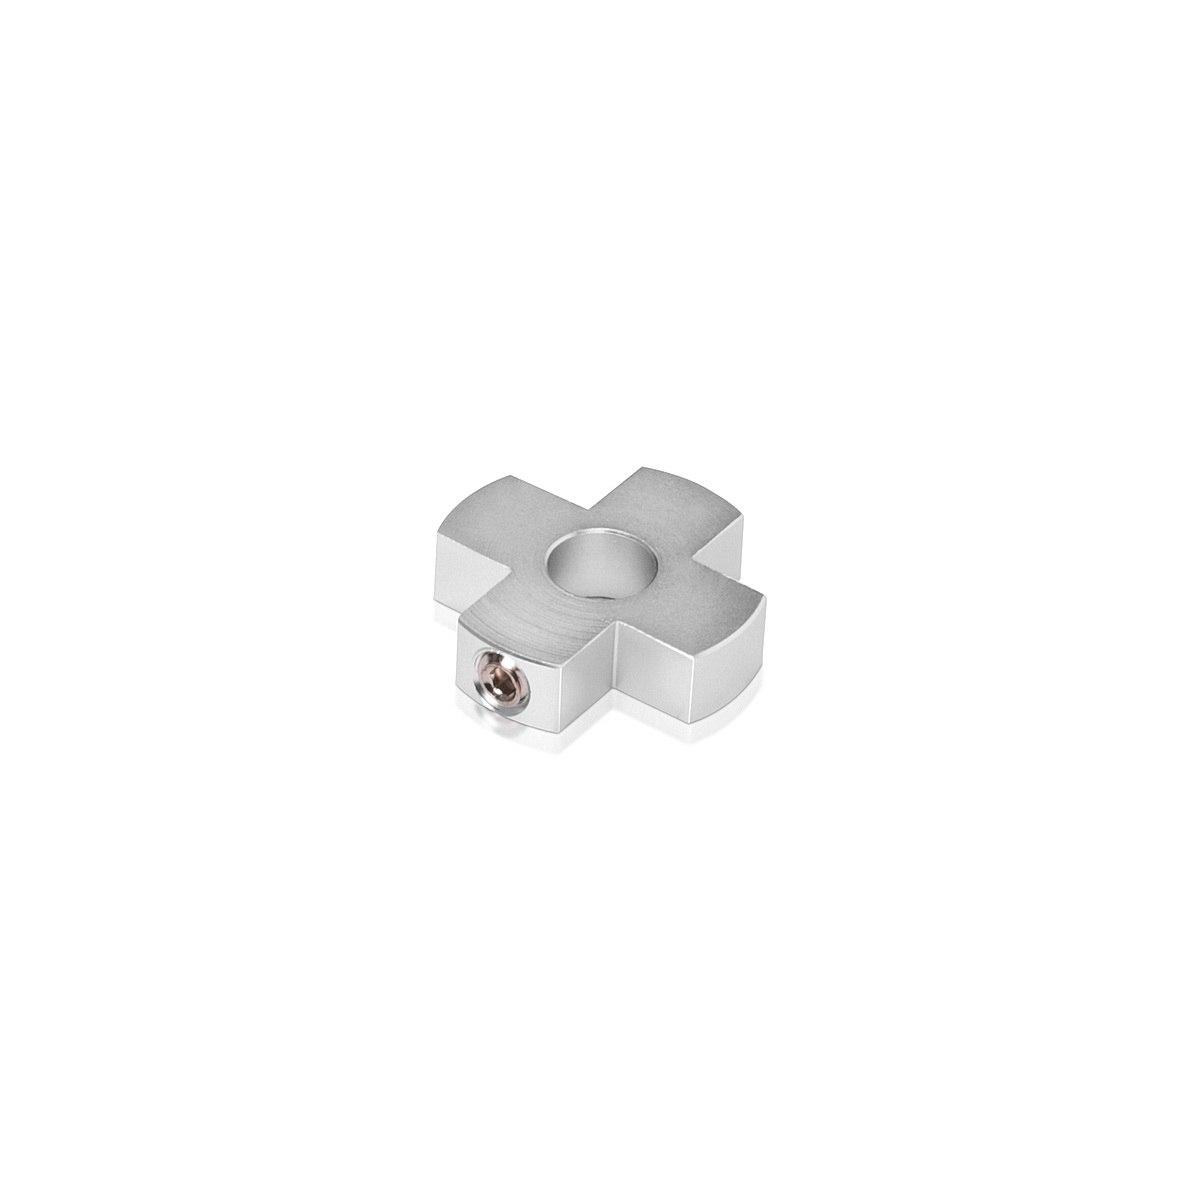 4-Way Standoffs Hub, Diameter: 1'', Thickness: 1/4'', Clear Anodized Aluminum